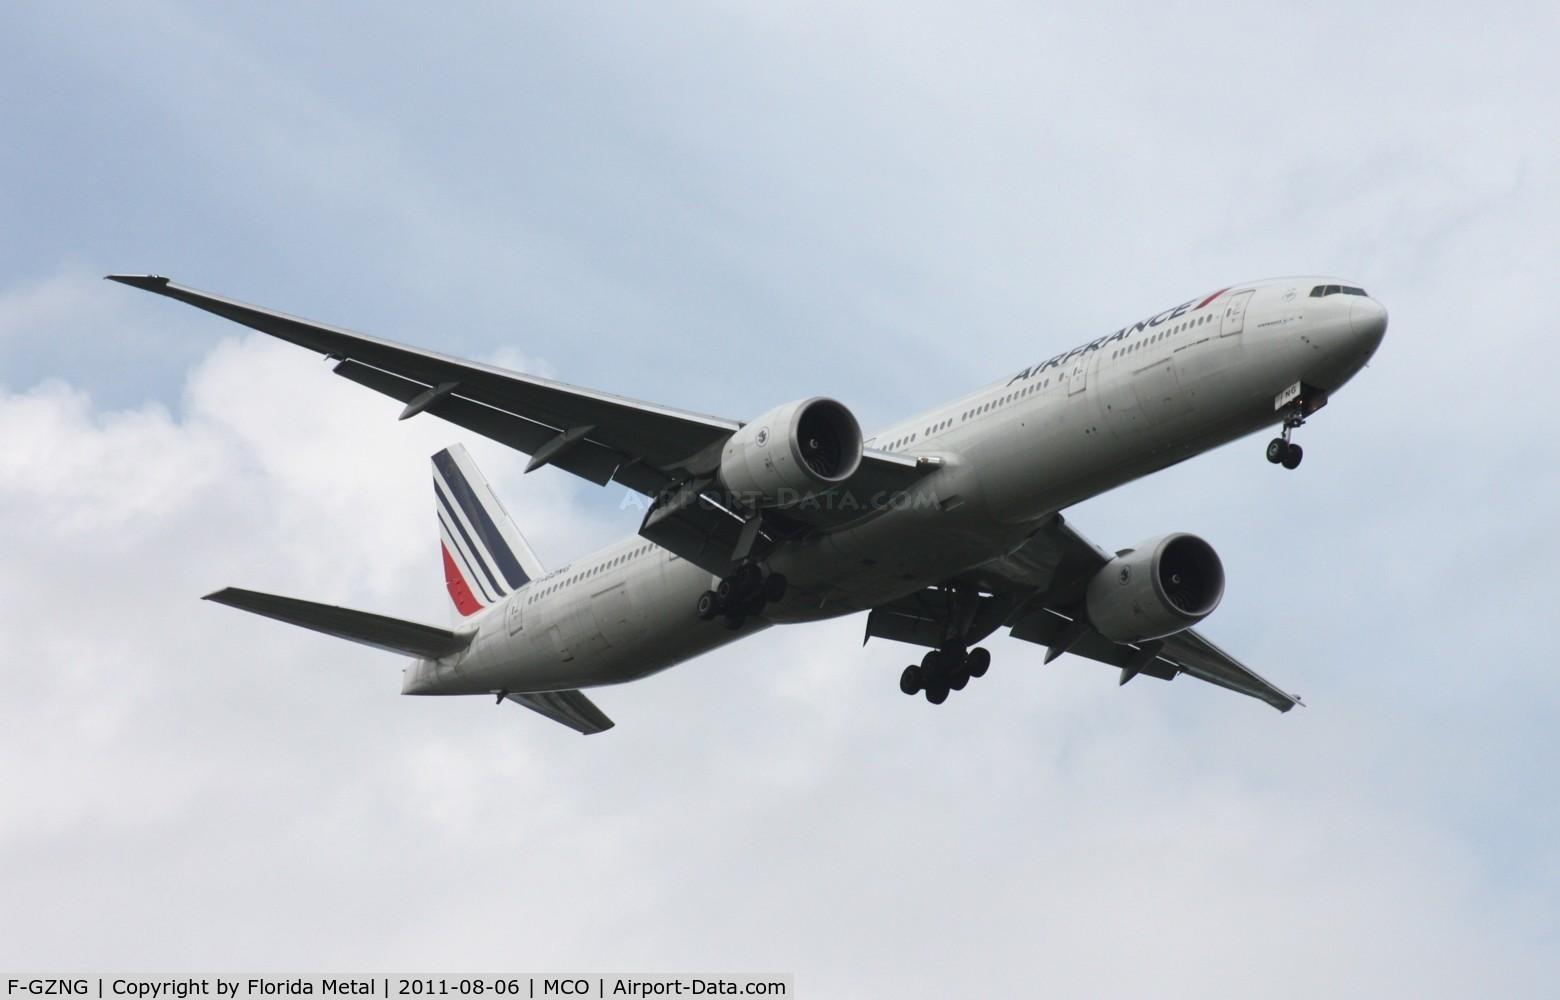 F-GZNG, 2009 Boeing 777-328/ER C/N 32968, Air France 777-300